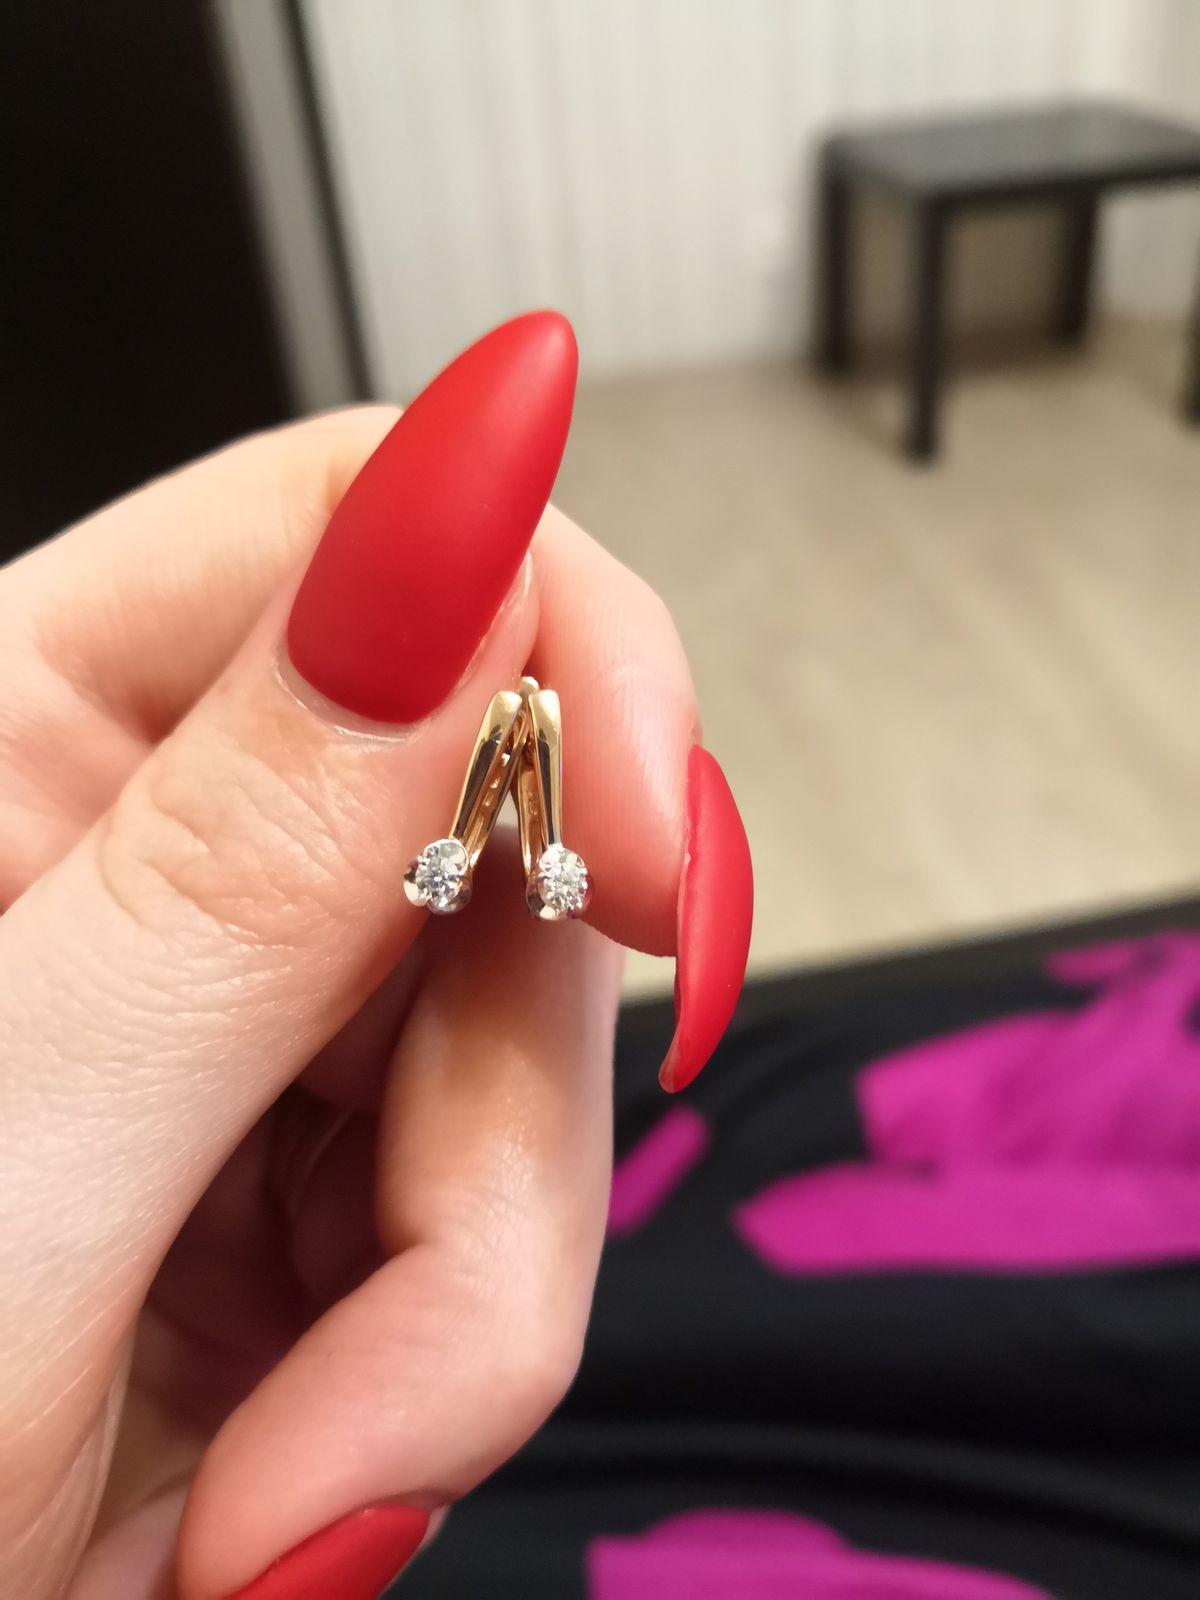 Серьги «Бриллианты Якутии» с 2 бриллиантами, 0.09 карат; Розовое золото 585